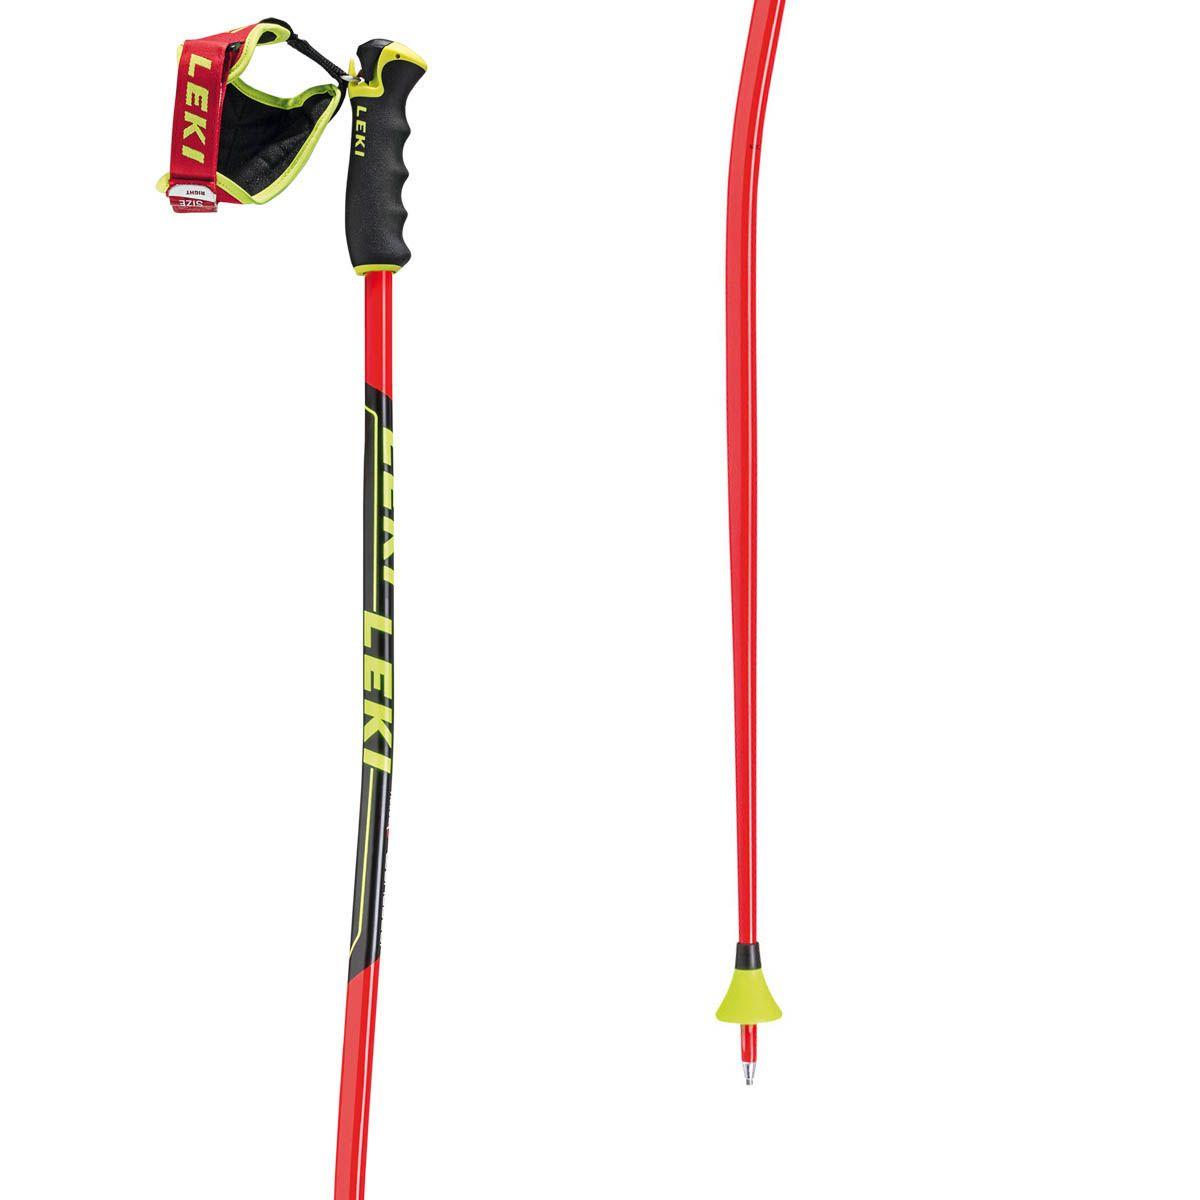 LEKI Worldcup Racing Racing Racing GS Ski Poles f5fc94